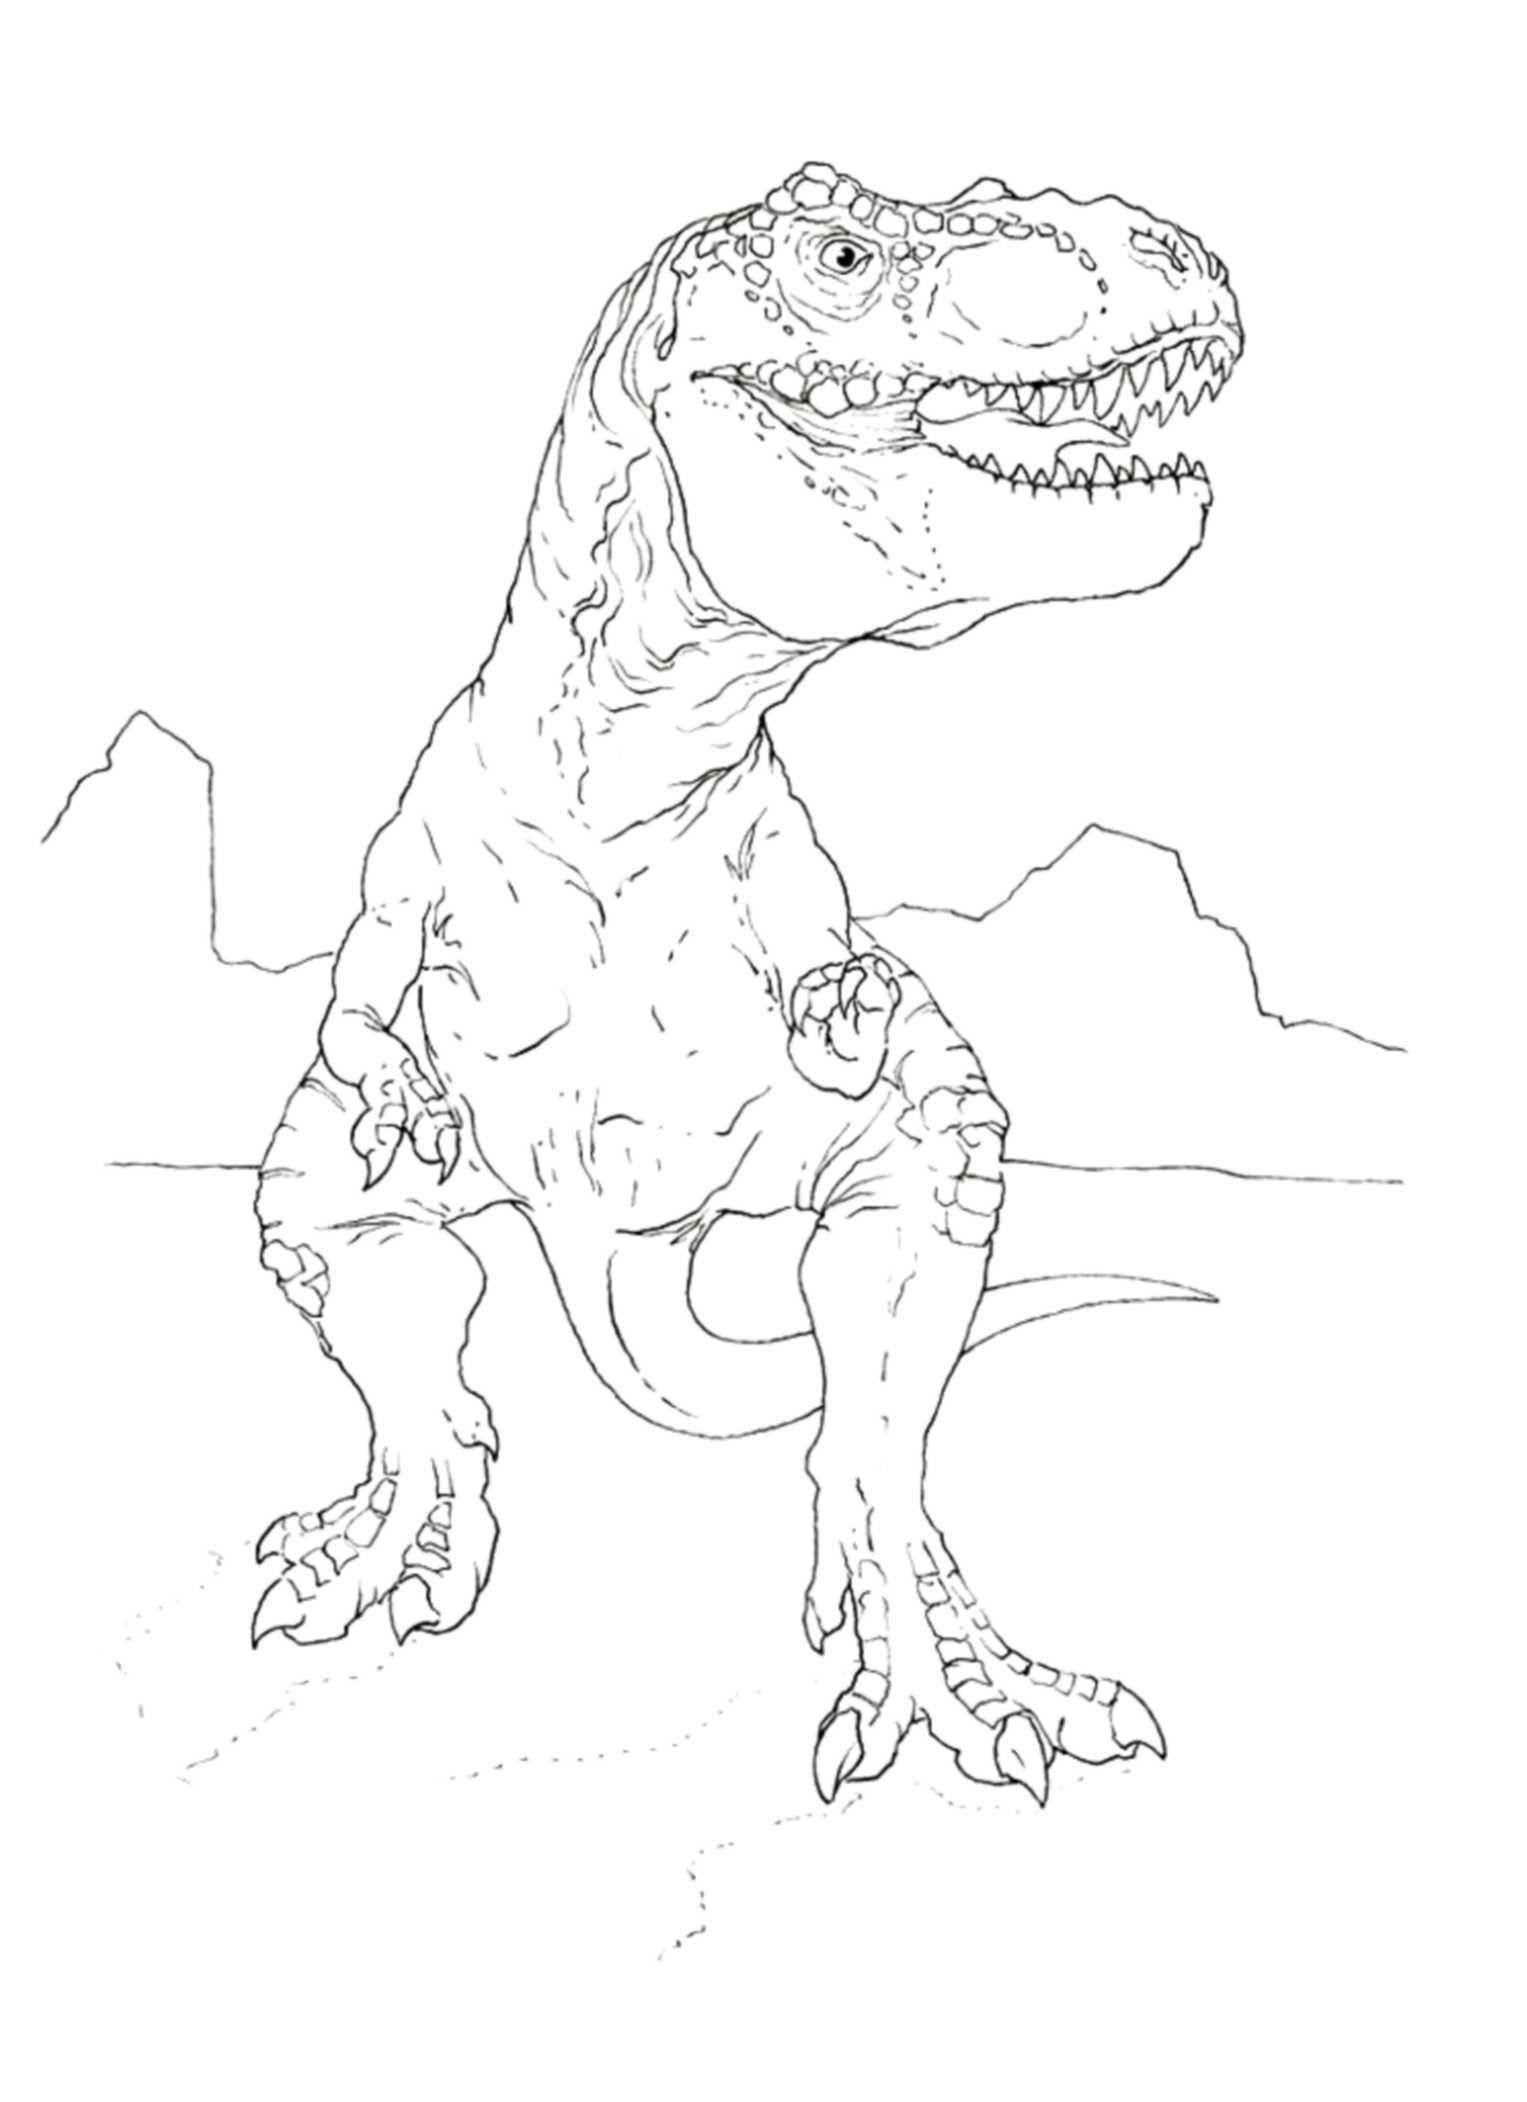 T Rex Coloring Sheets Dinosaur T Rex Coloring Pages In 2020 Dinosaur Coloring Pages Free Coloring Pages Dinosaur Coloring